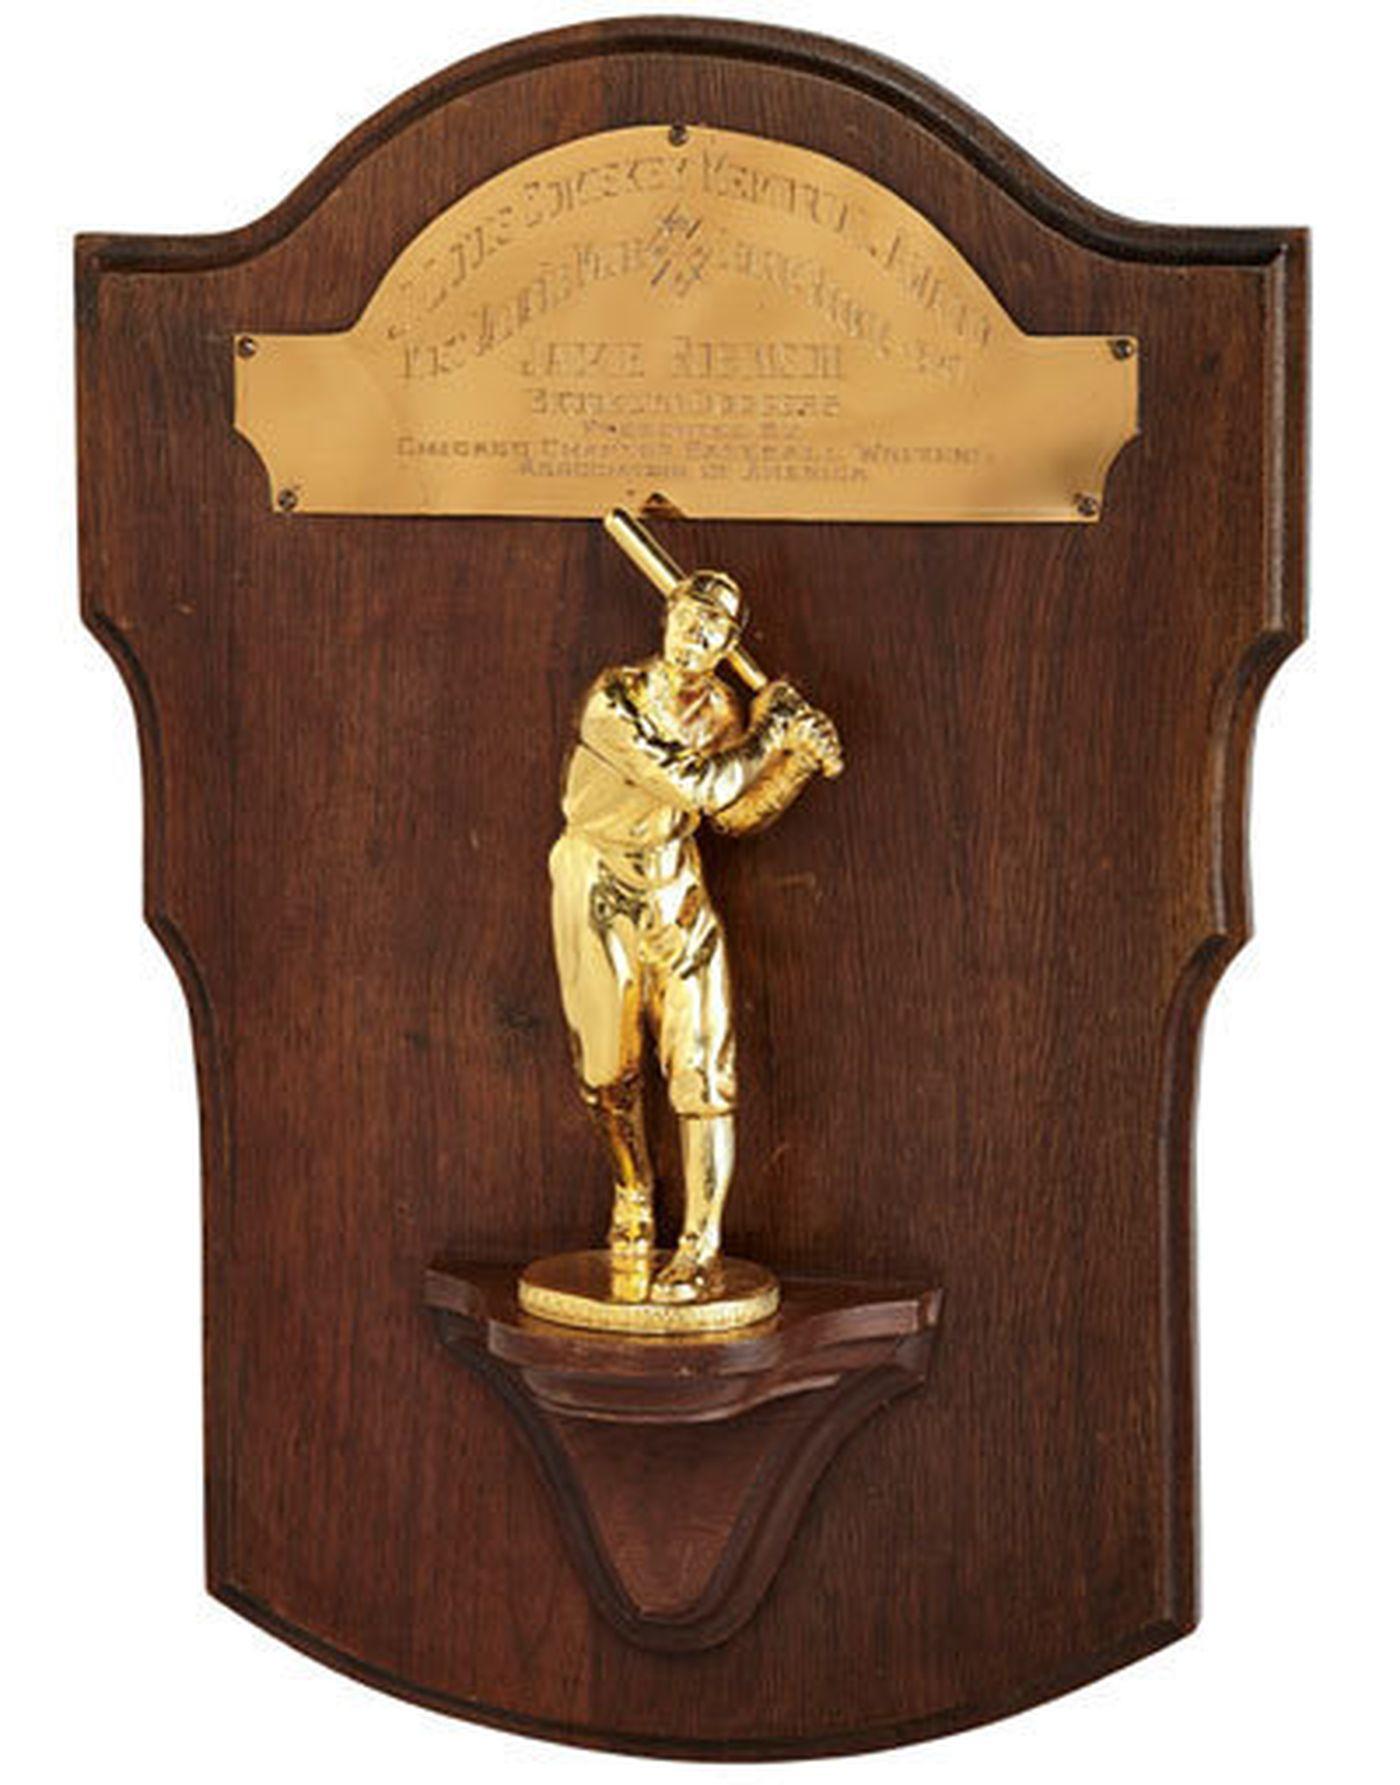 Jackie Robinson Award